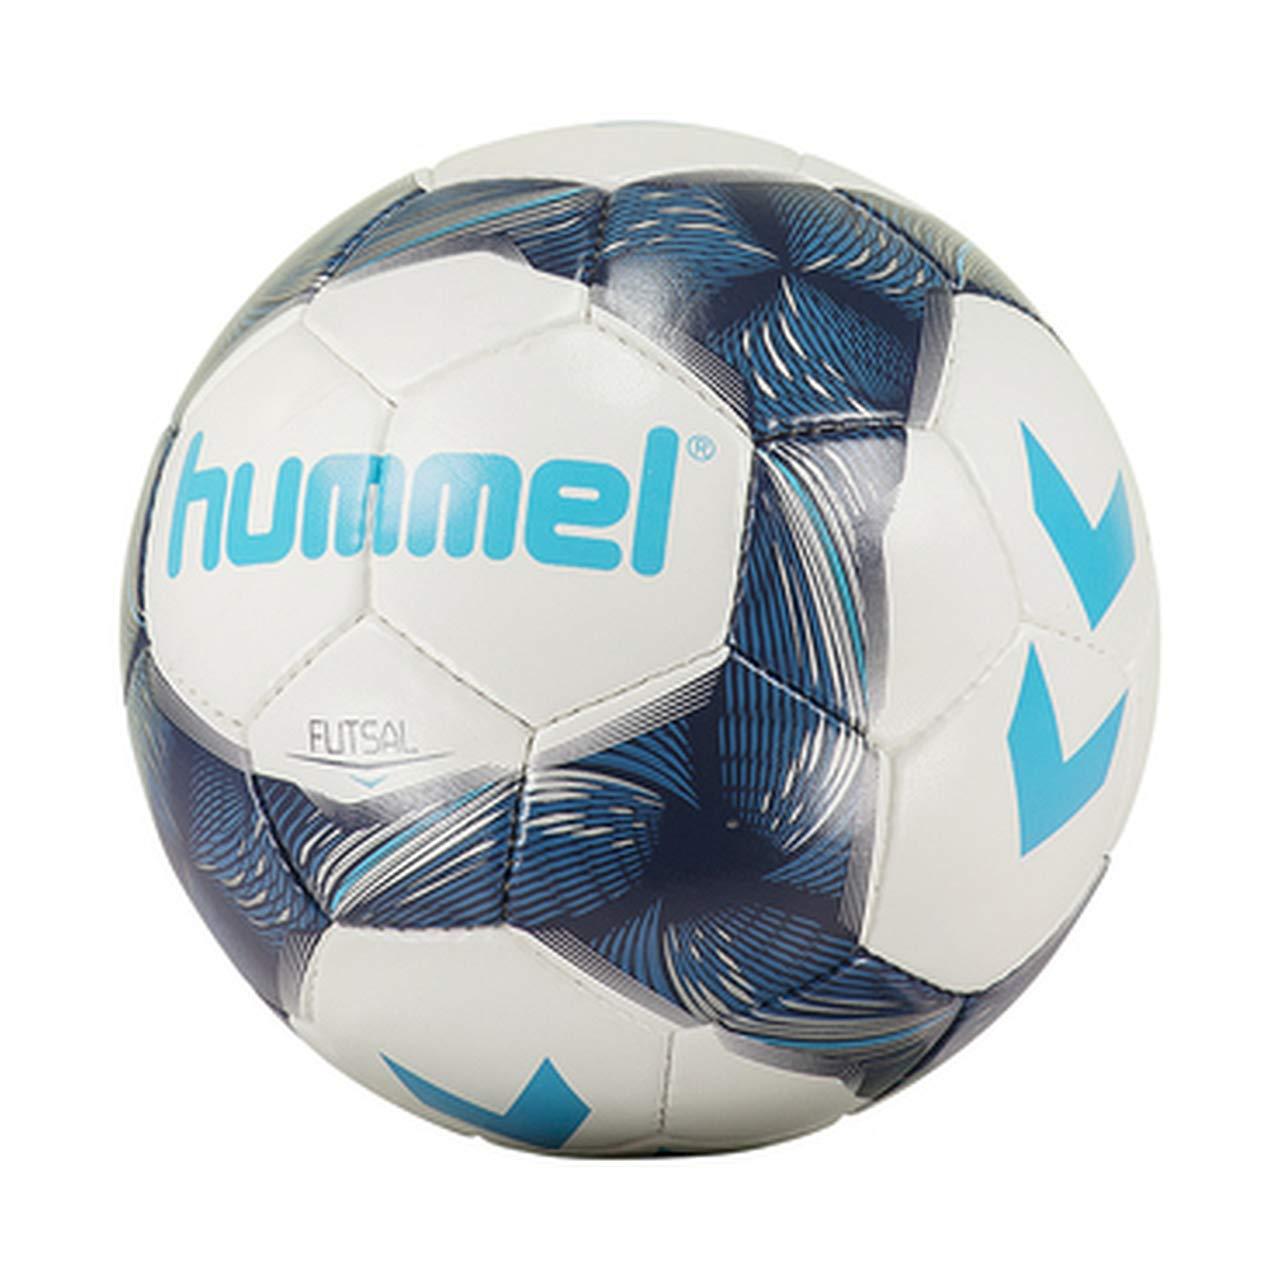 Hummel Futsal - White/Vintage Indigo/turquesa, color multicolor ...